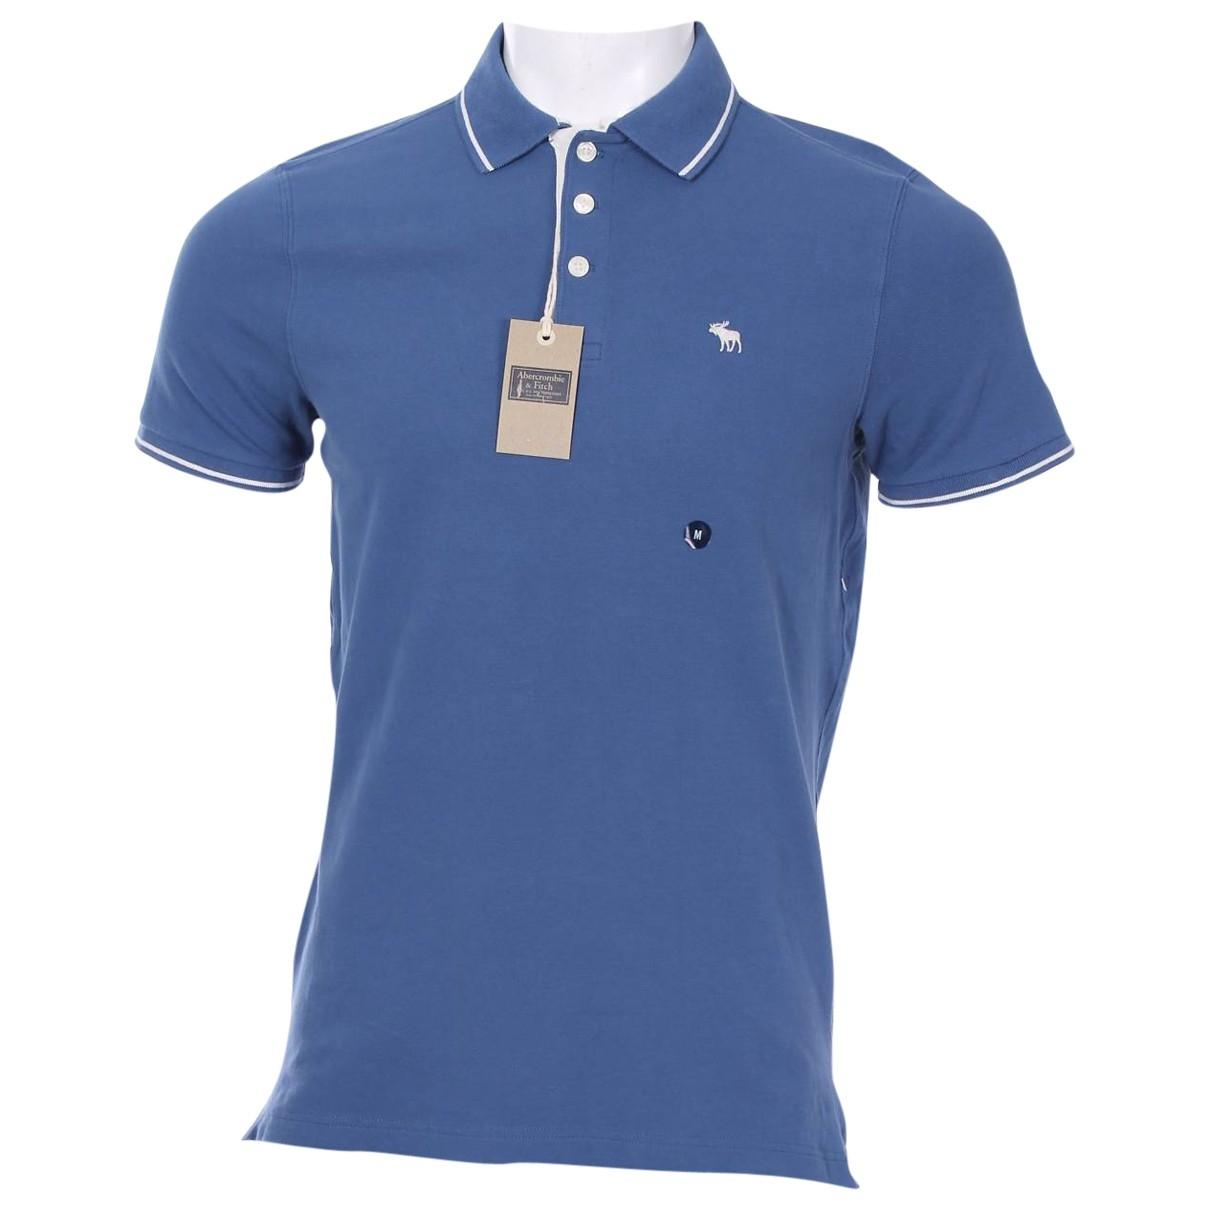 Abercrombie & Fitch \N Poloshirts in  Blau Baumwolle